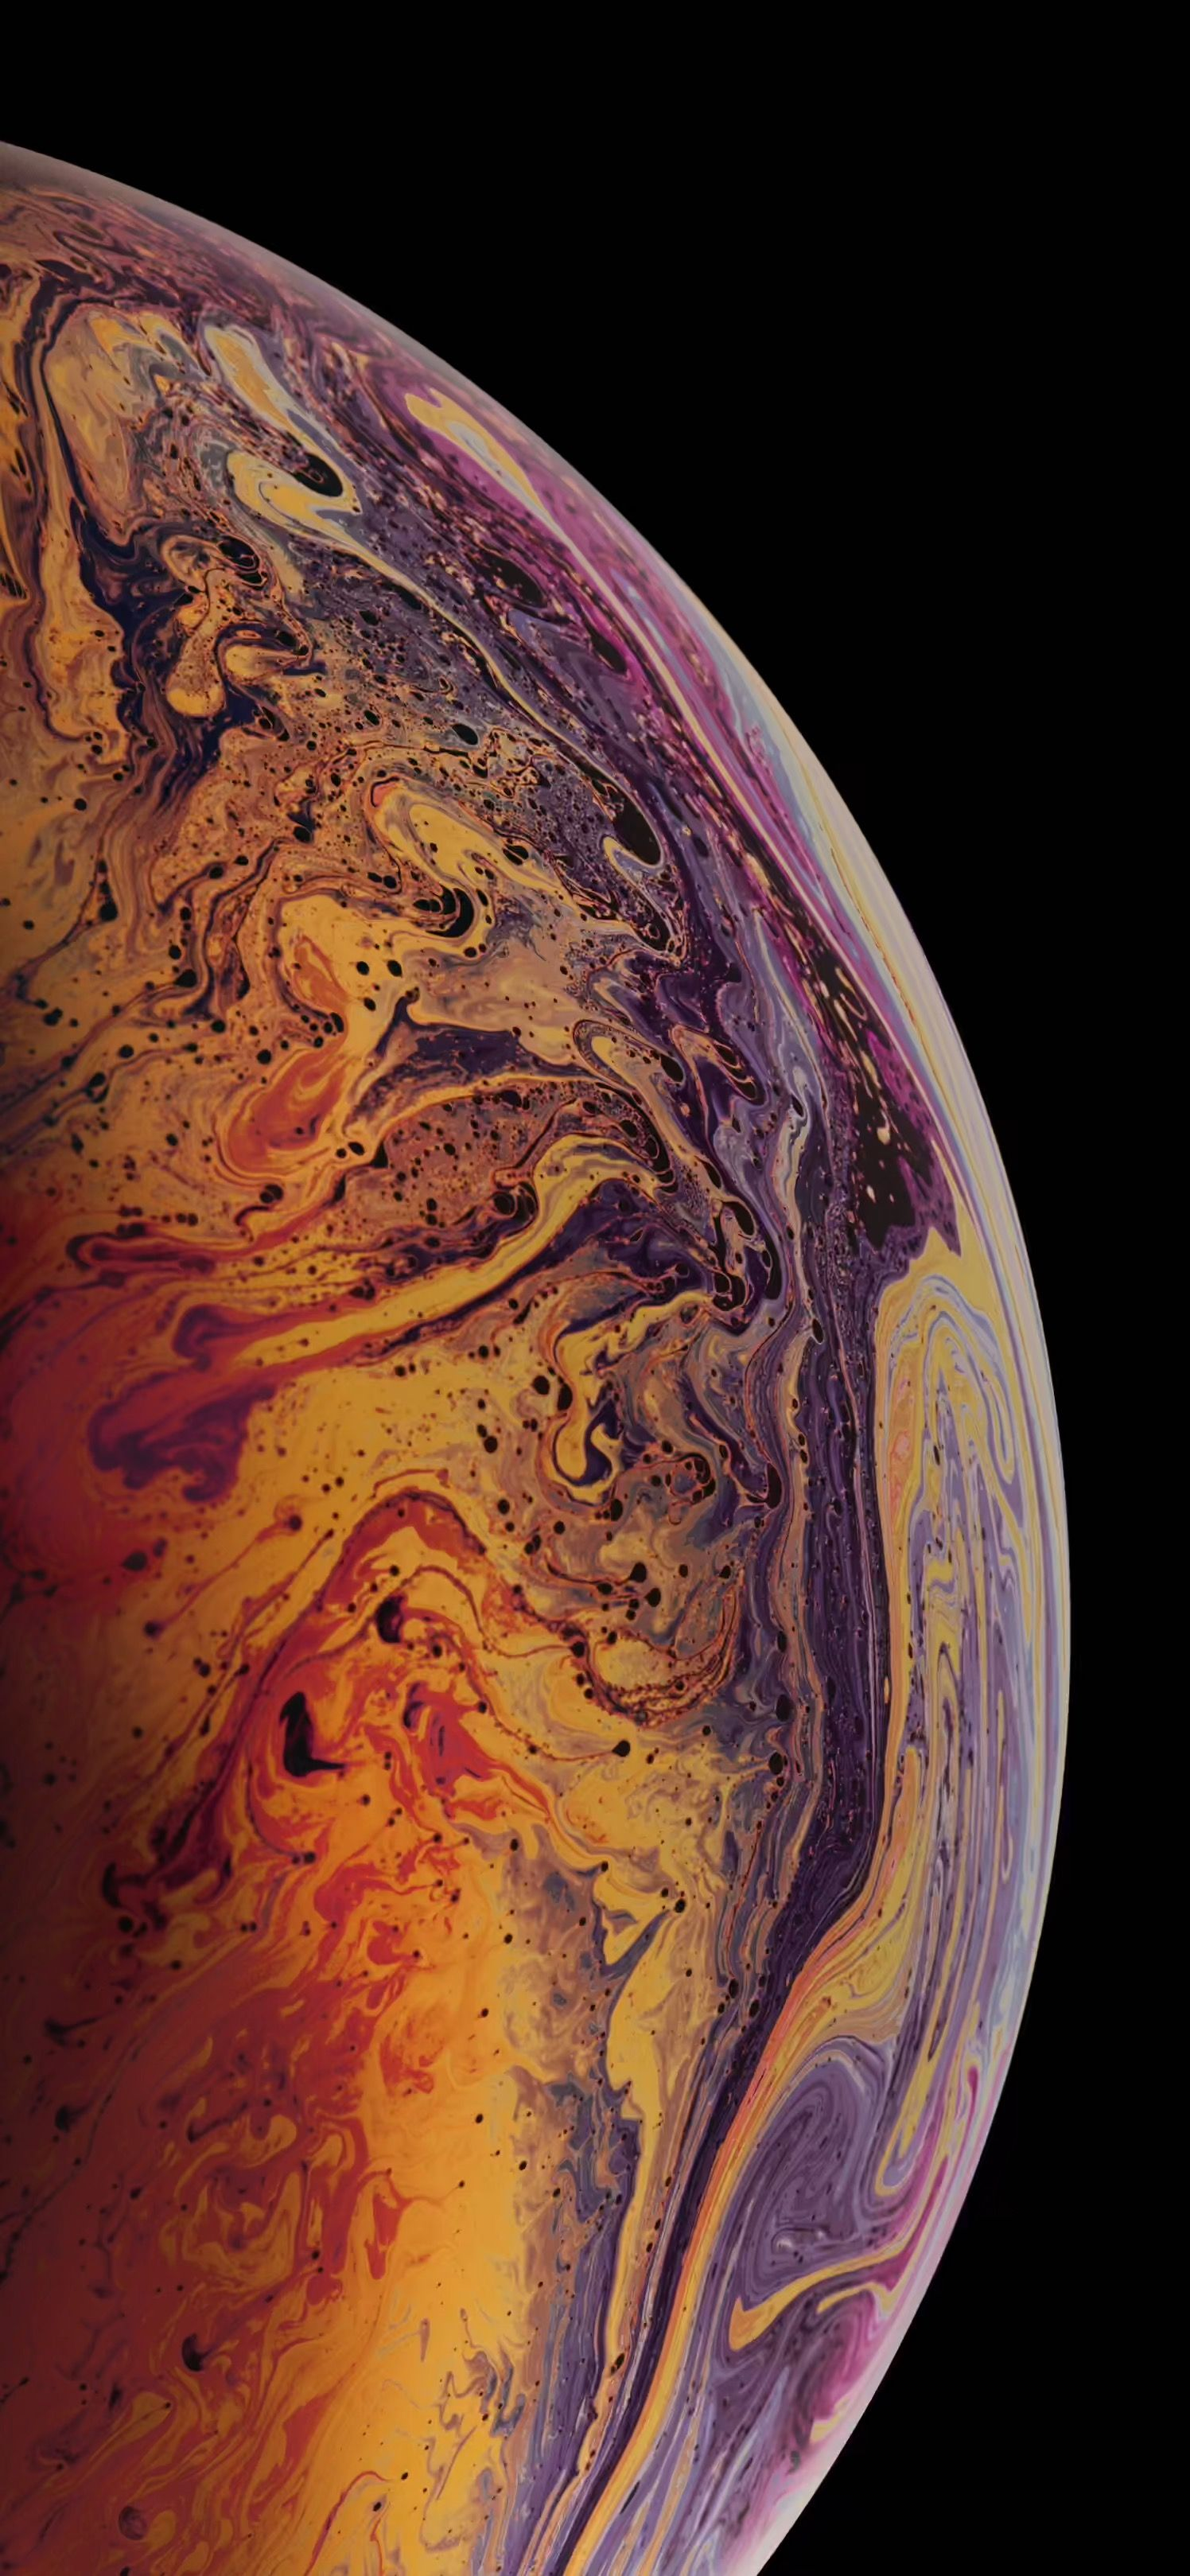 Original IPhone X XS wallpaper Apple iPhone XS Max Wallpaper 1496x3238